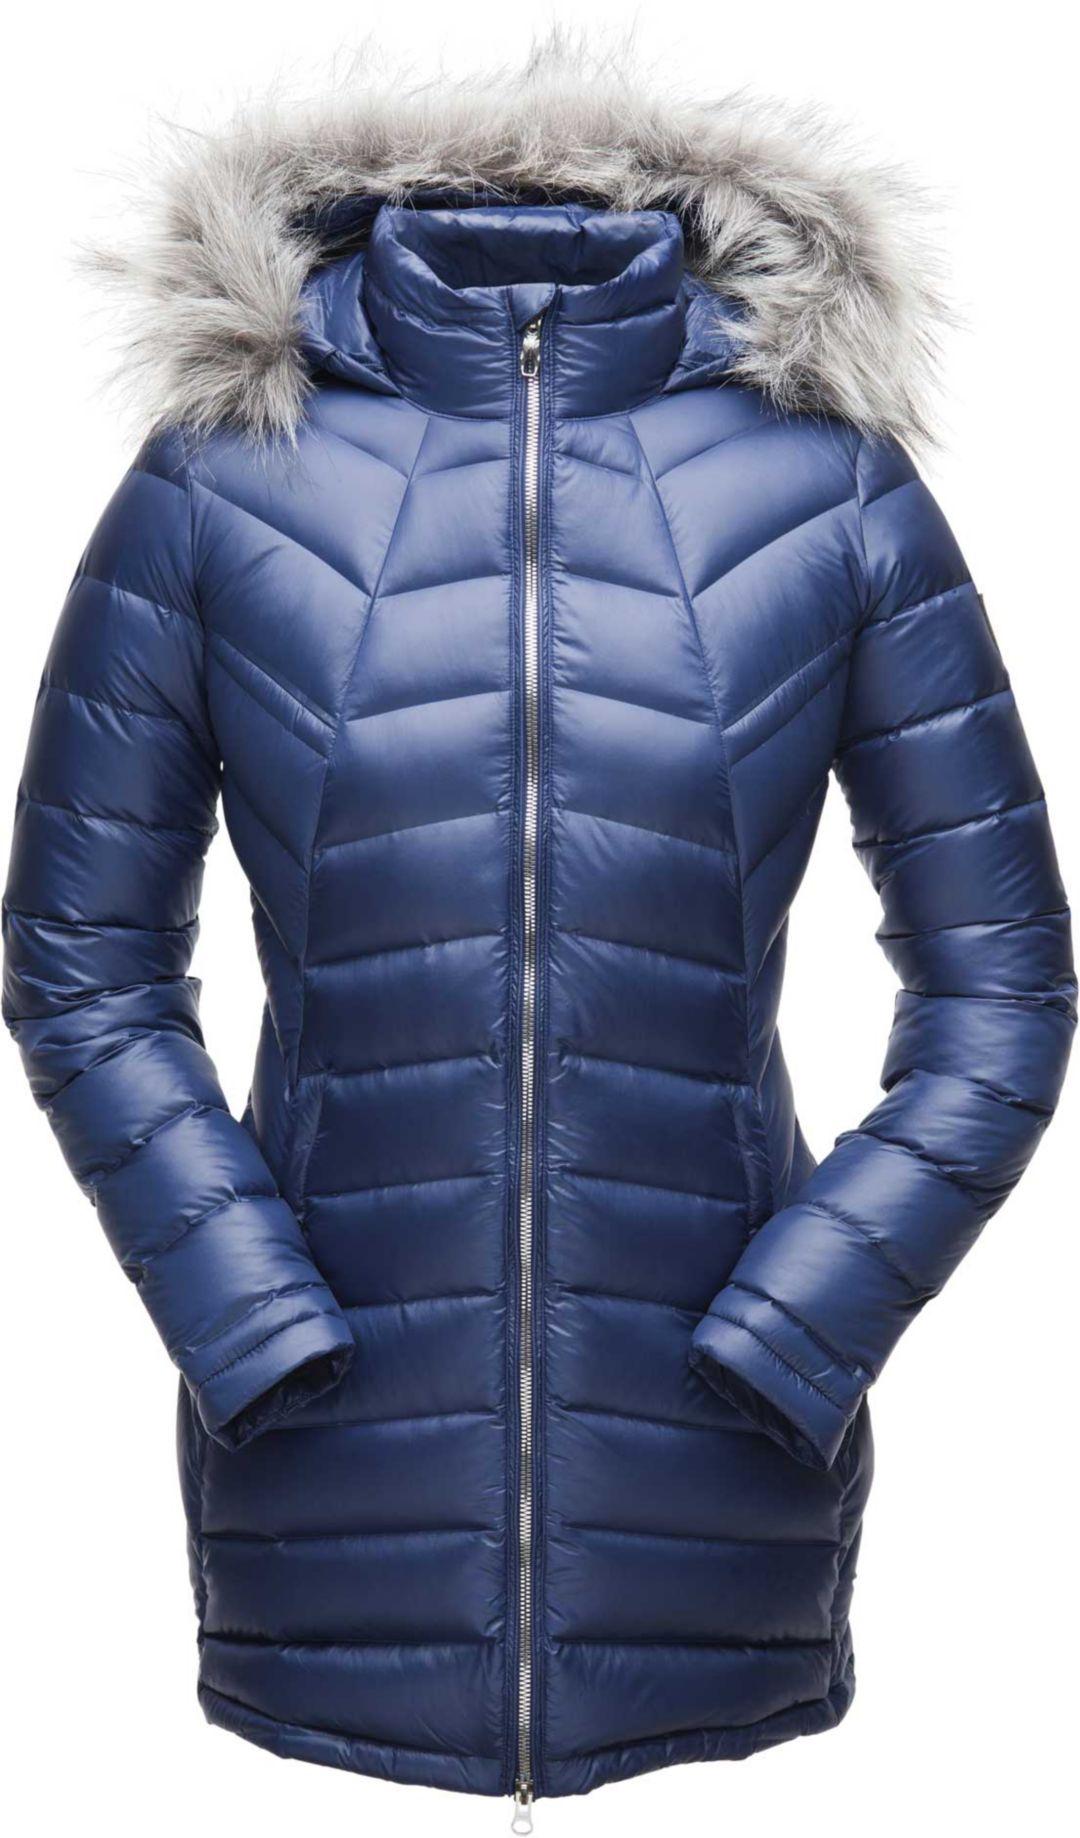 1e21fb577 Spyder Women's Syrround Faux Fur Jacket